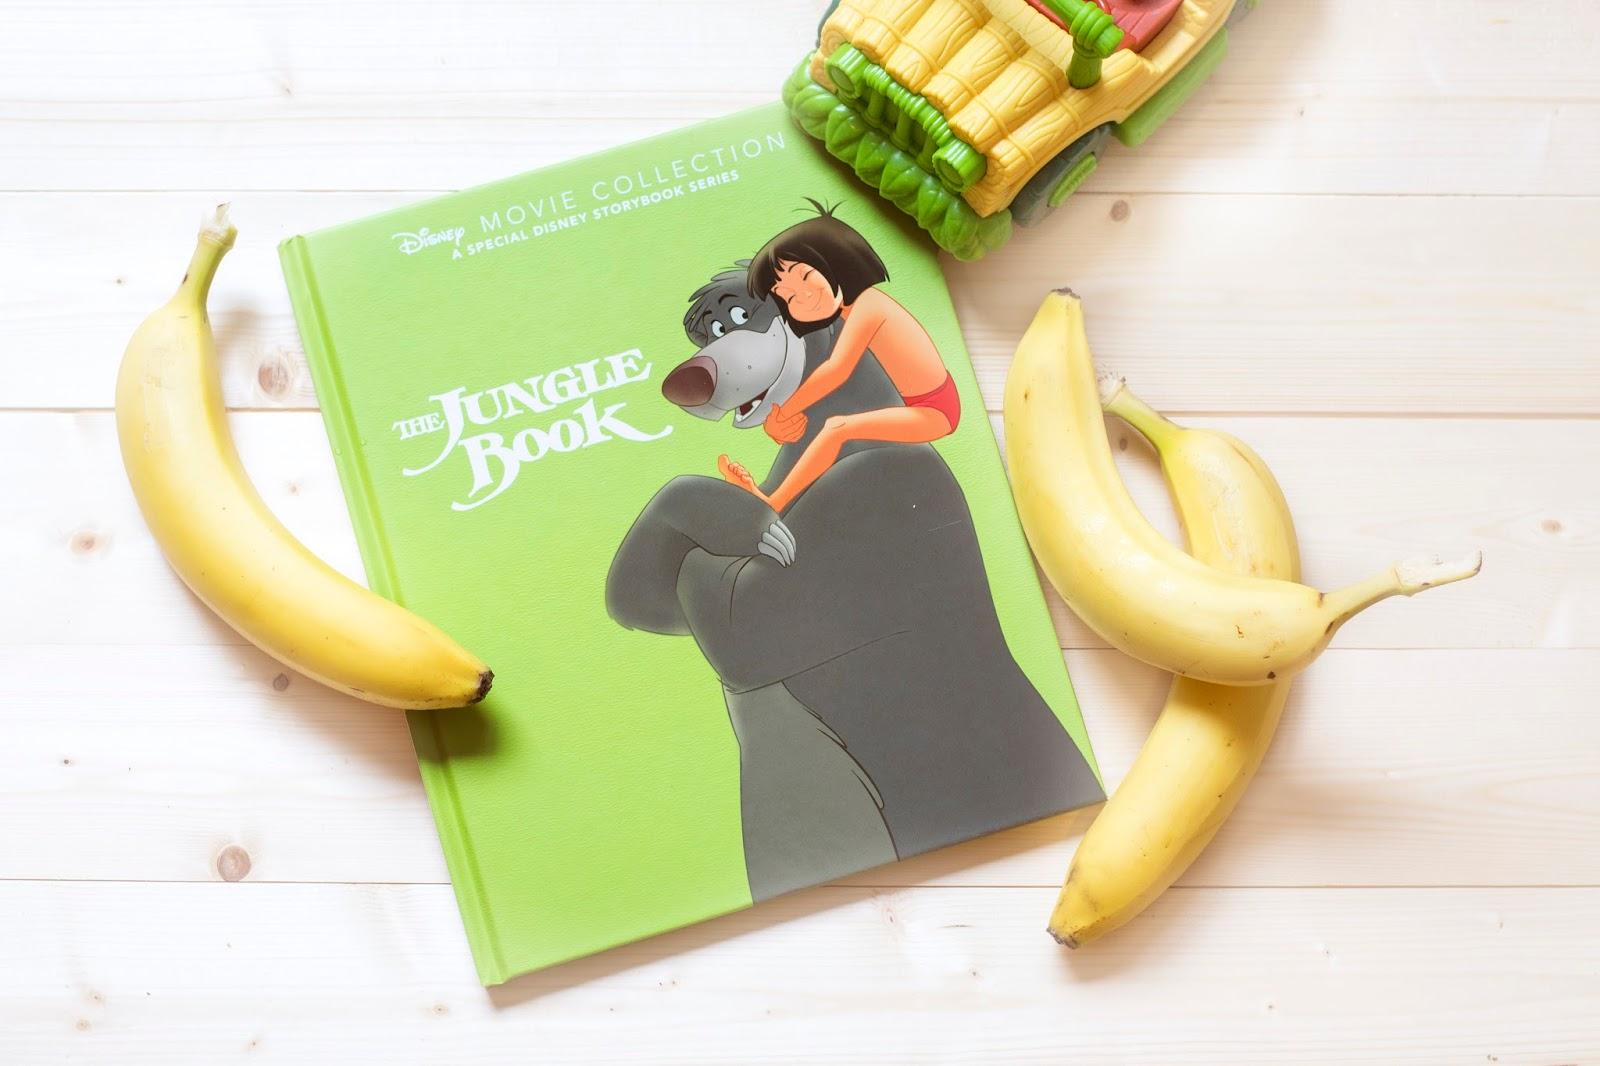 DISNEY BOOK WEEK: THE JUNGLE BOOK [PARRAGON BOOK BUDDIES]